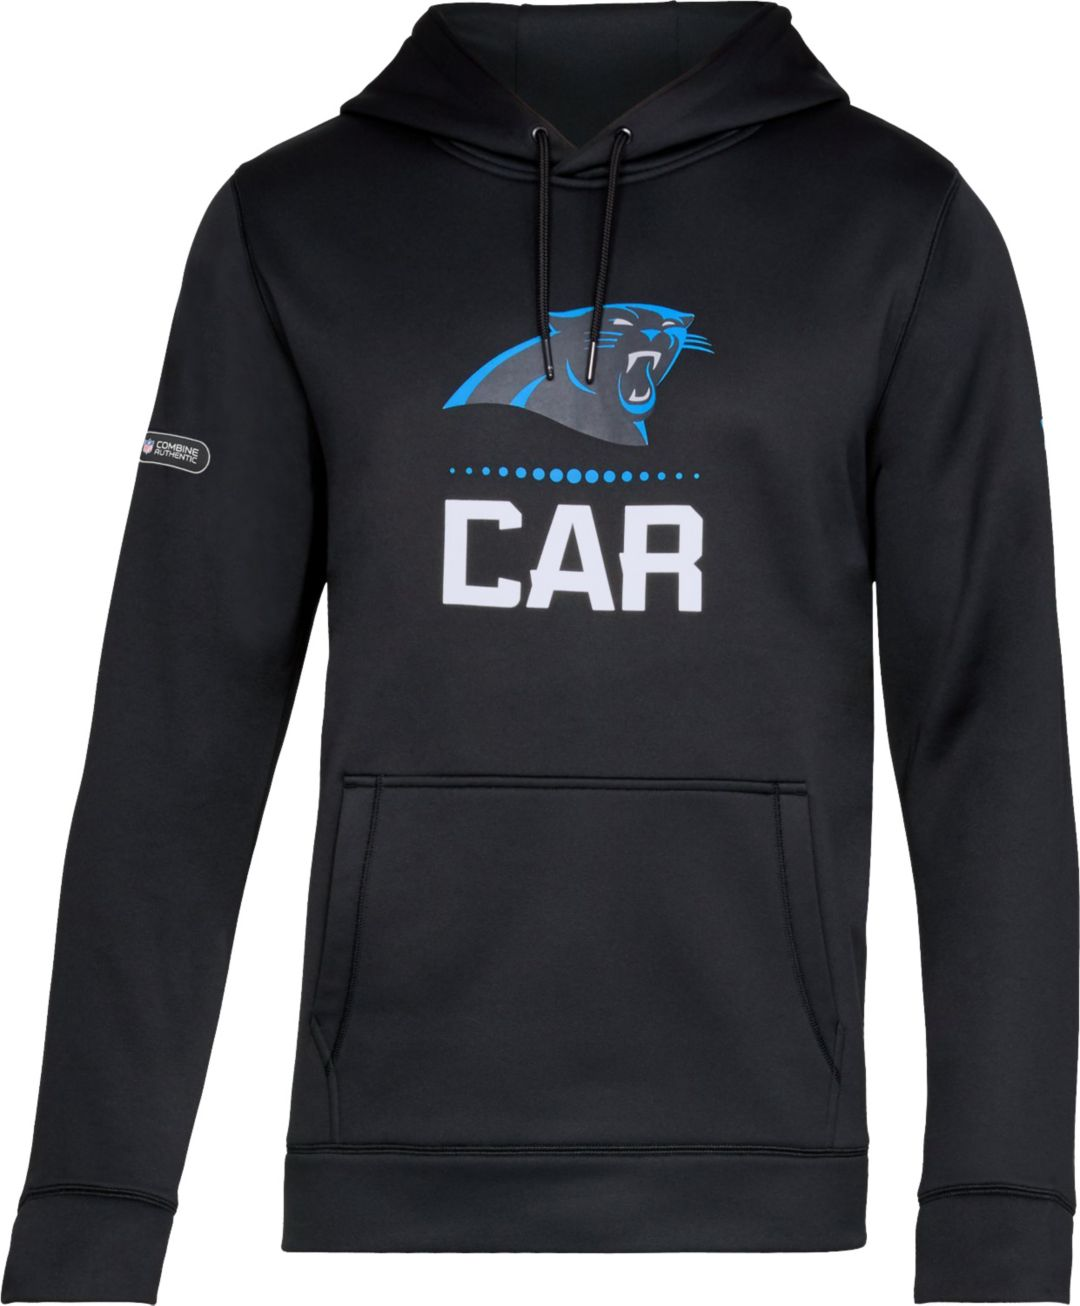 New Under Armour NFL Combine Authentic Men's Carolina Panthers Lockup  hot sale